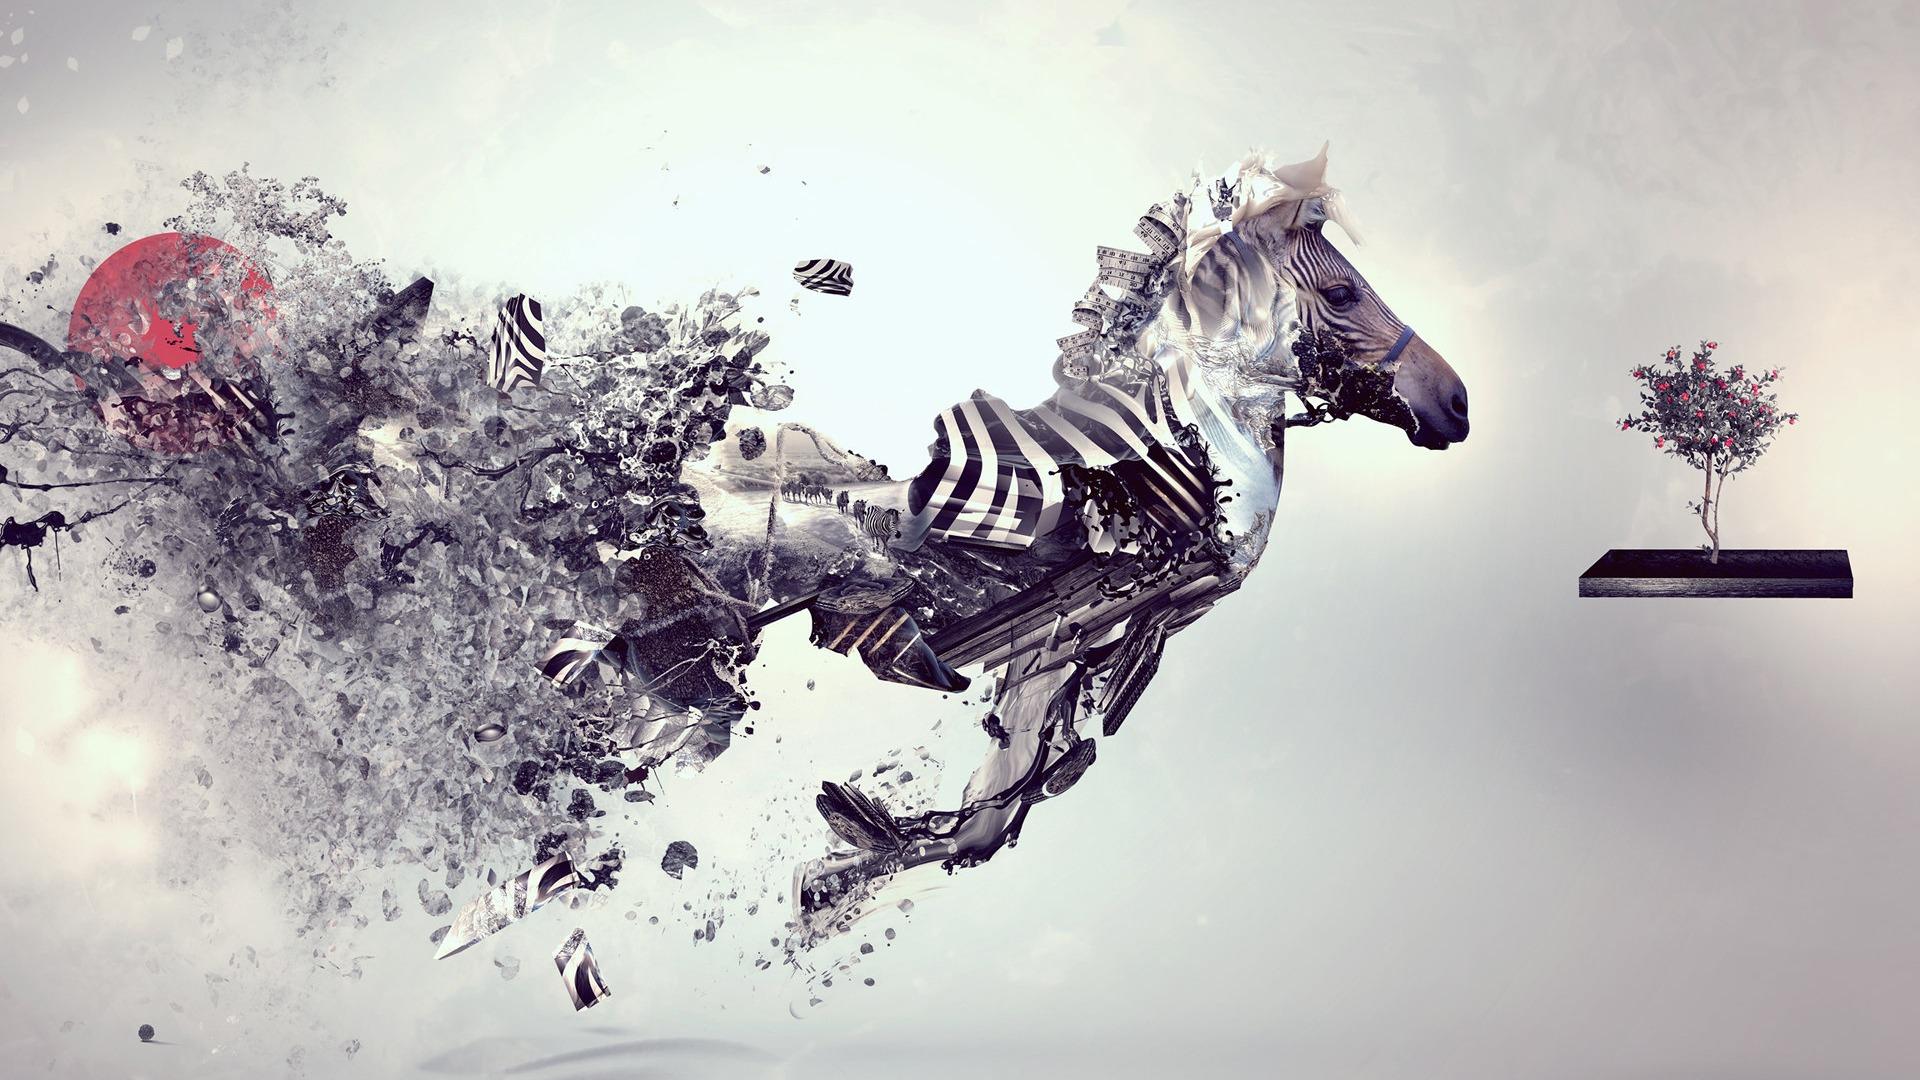 Animal Theme Design Wallpaper Computer Ps Preview